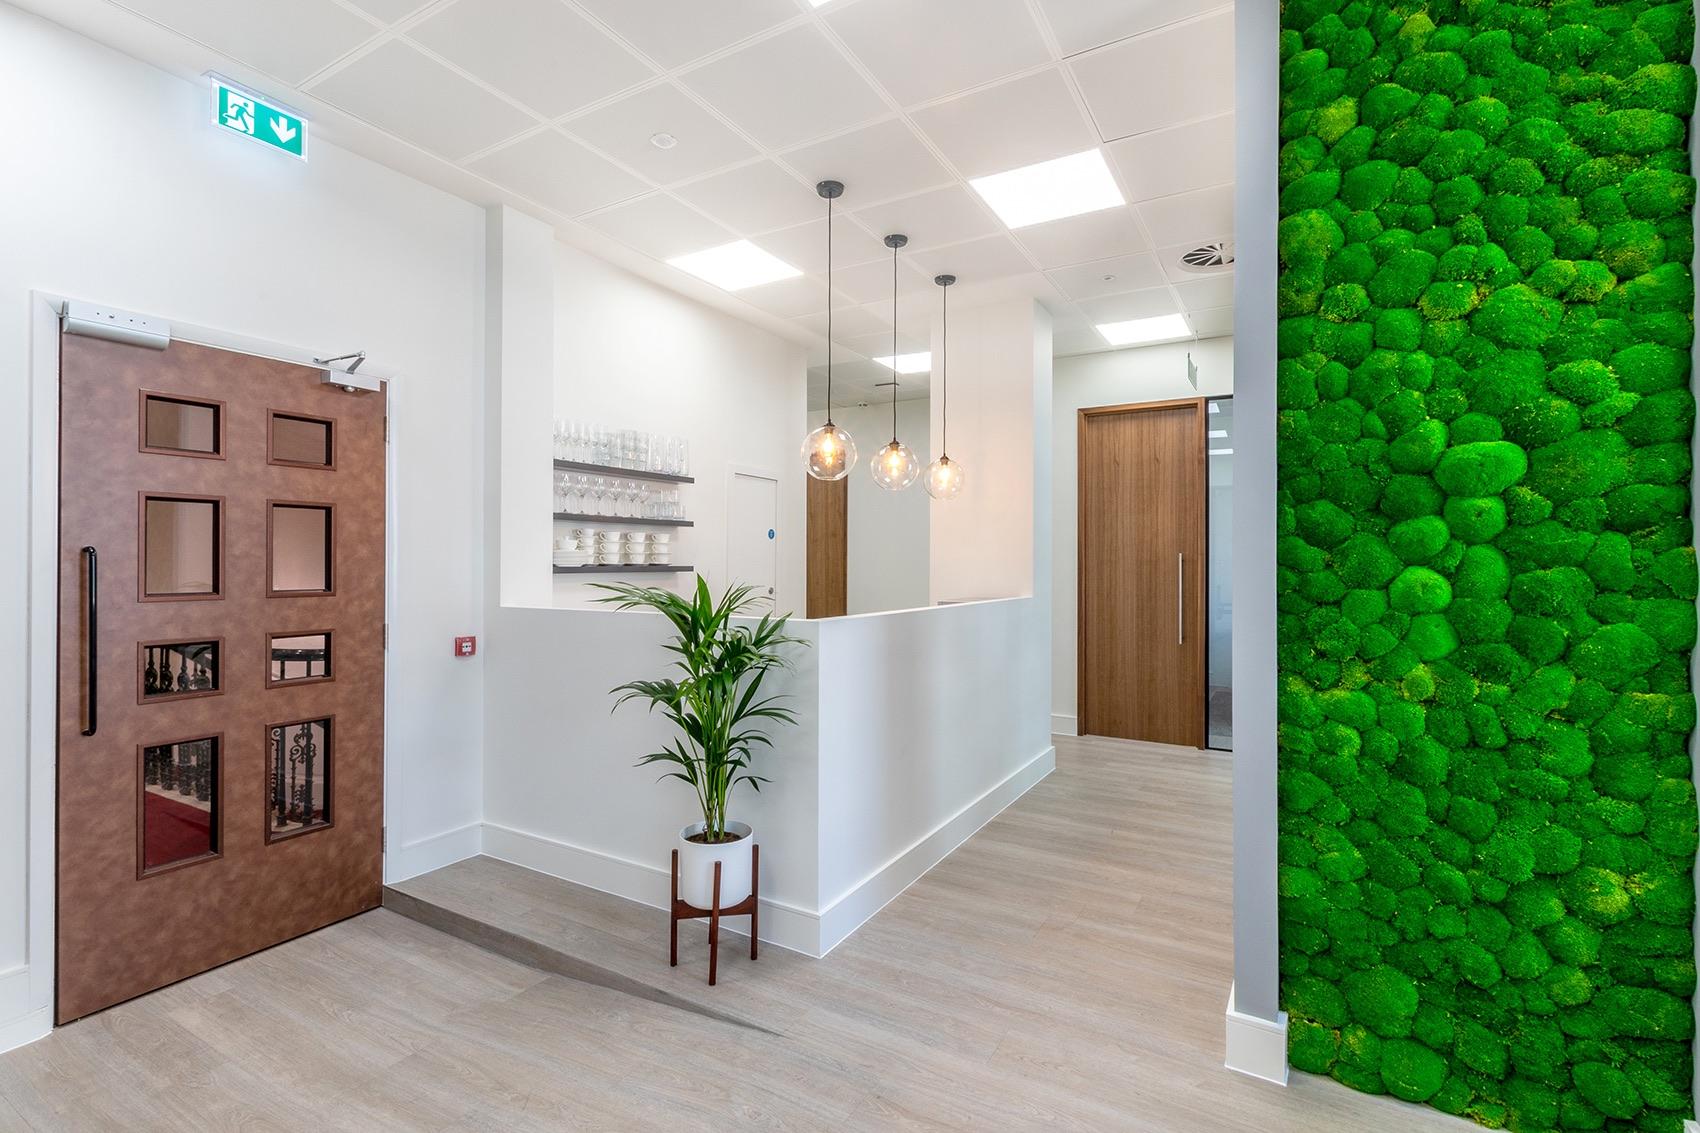 iona-capital-london-office-3